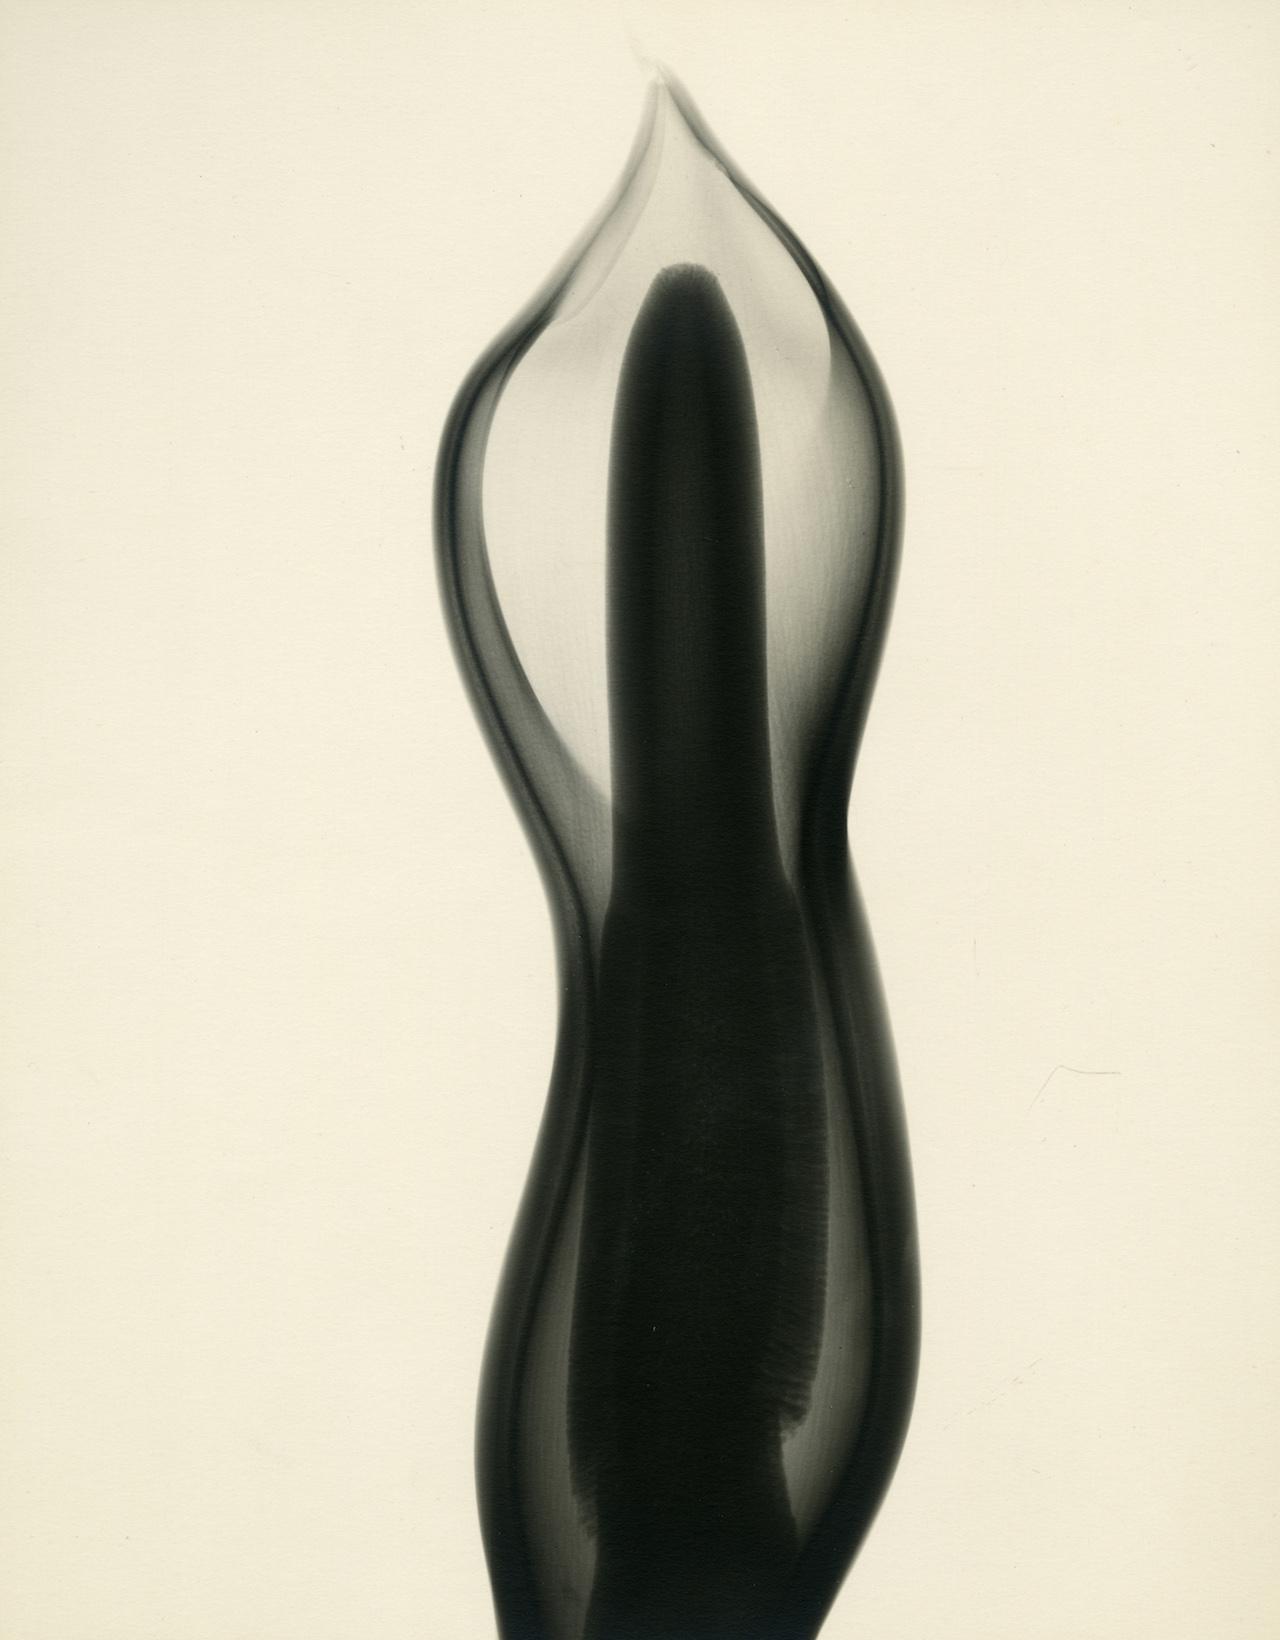 Tasker, Philodendron, 1938